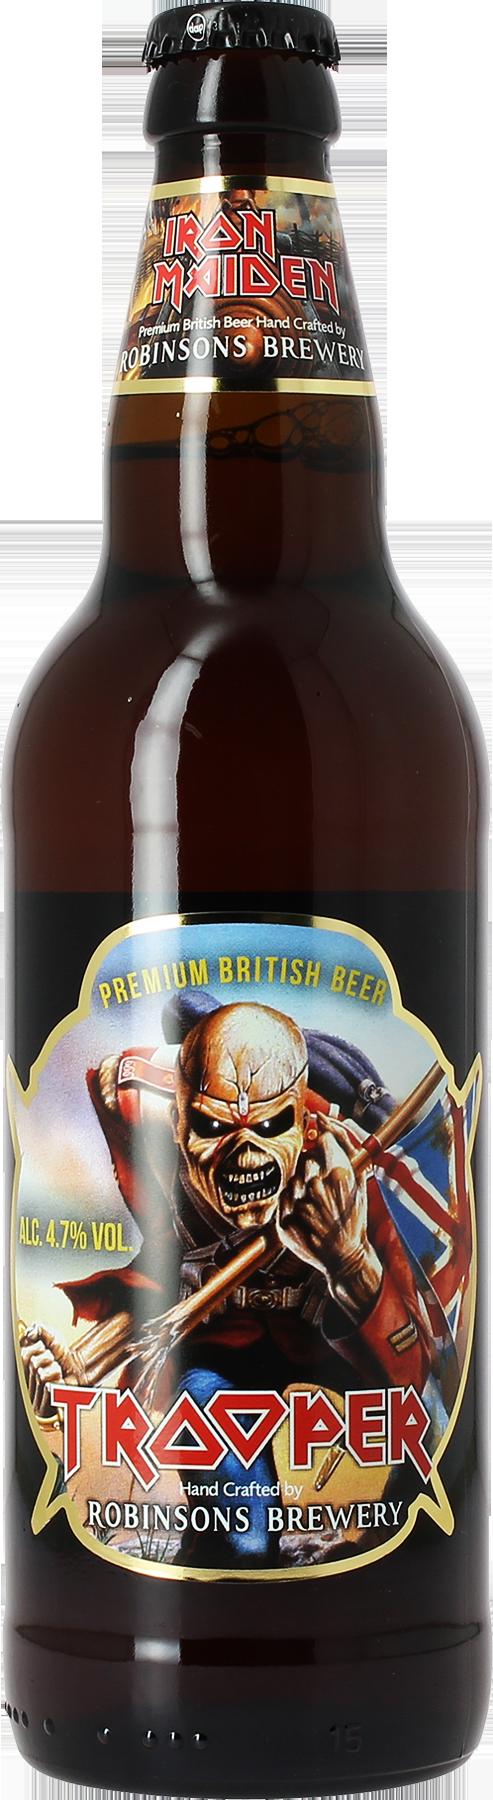 Iron Maiden Trooper - 50cl - Hopt